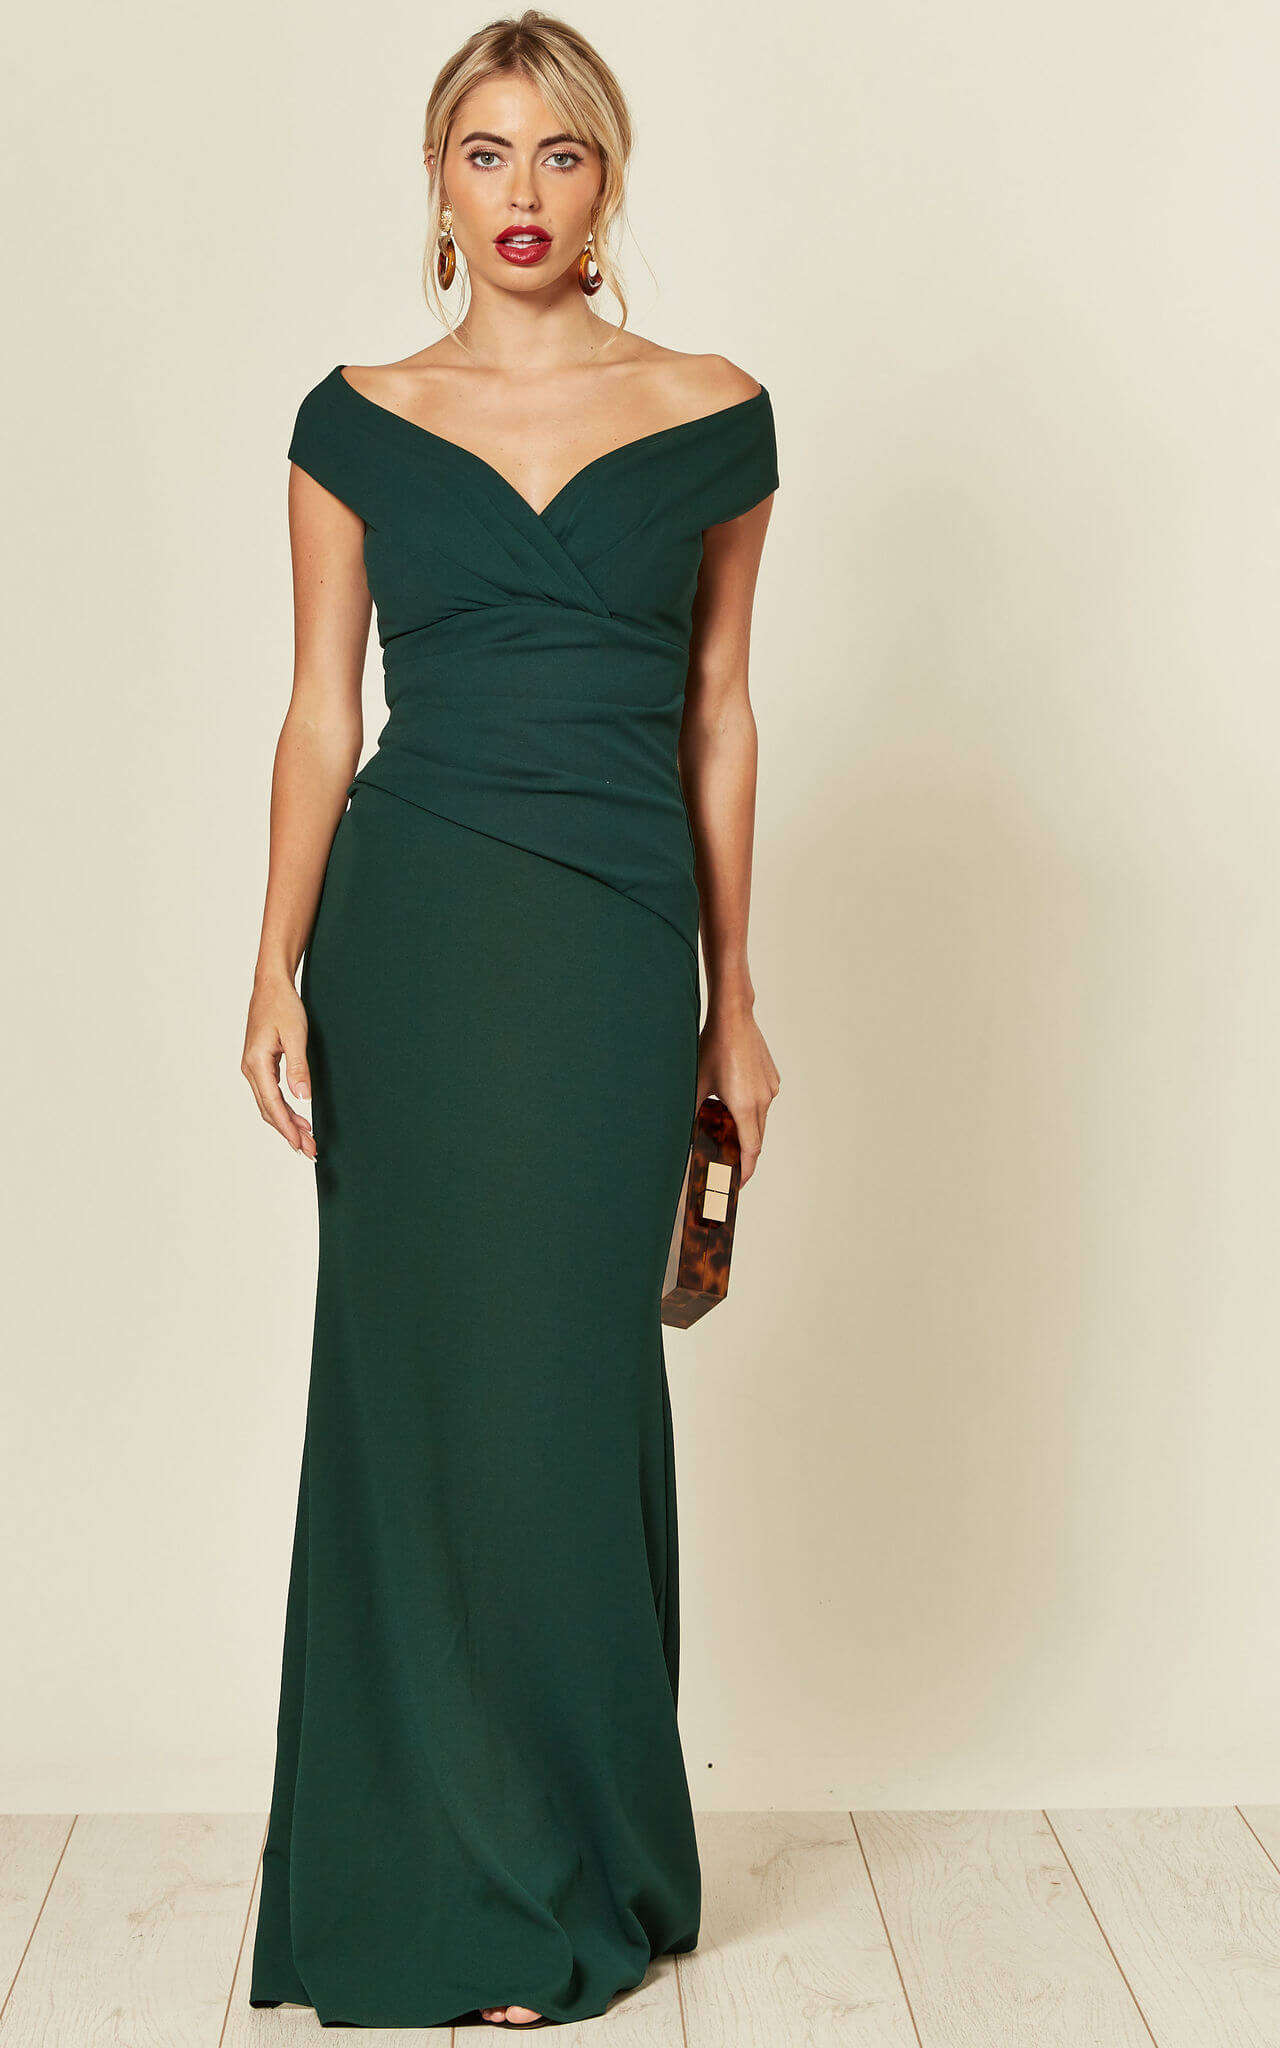 Model wears a maxi length dark green dress with fishtail hem